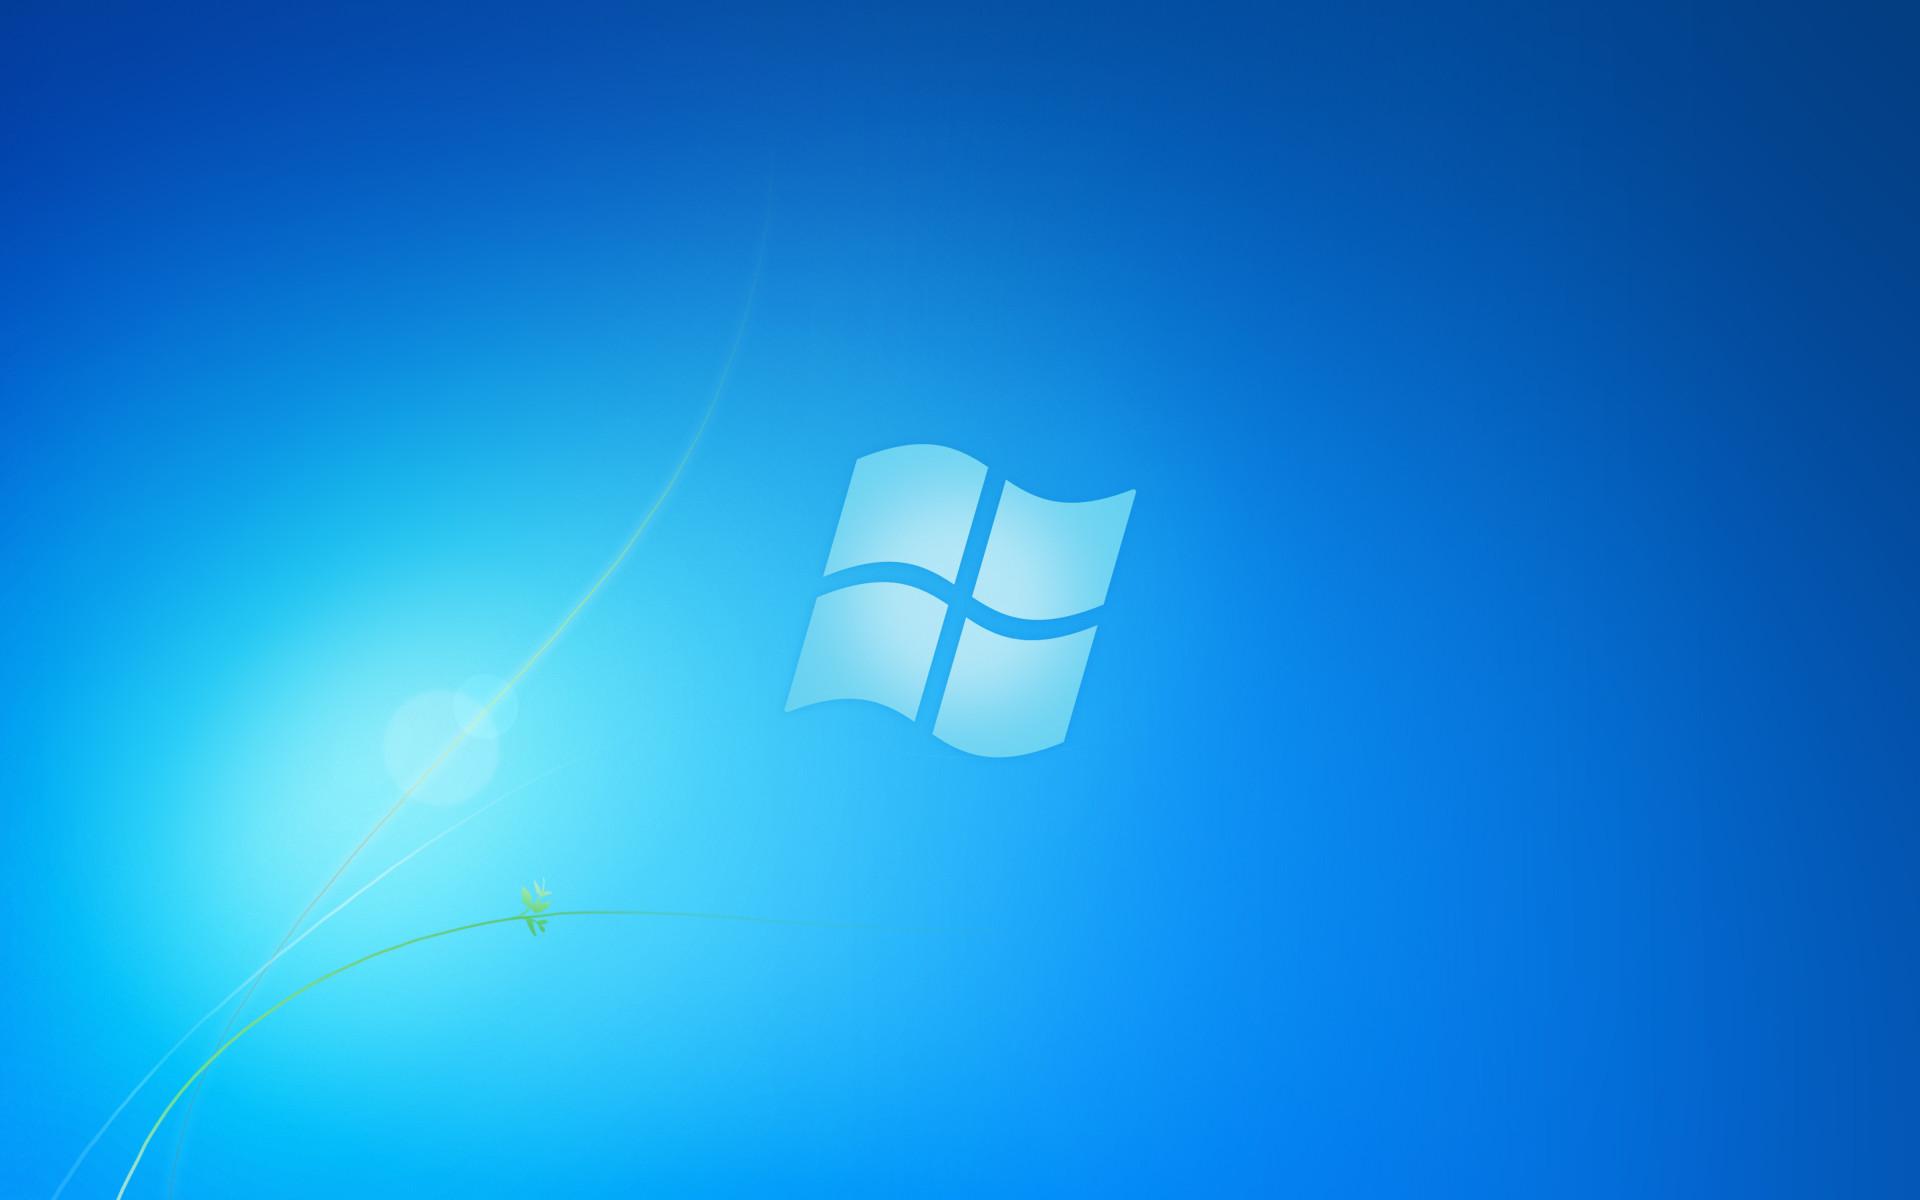 1920x1080 Windows 7 Ultimate II HD Wallpaper